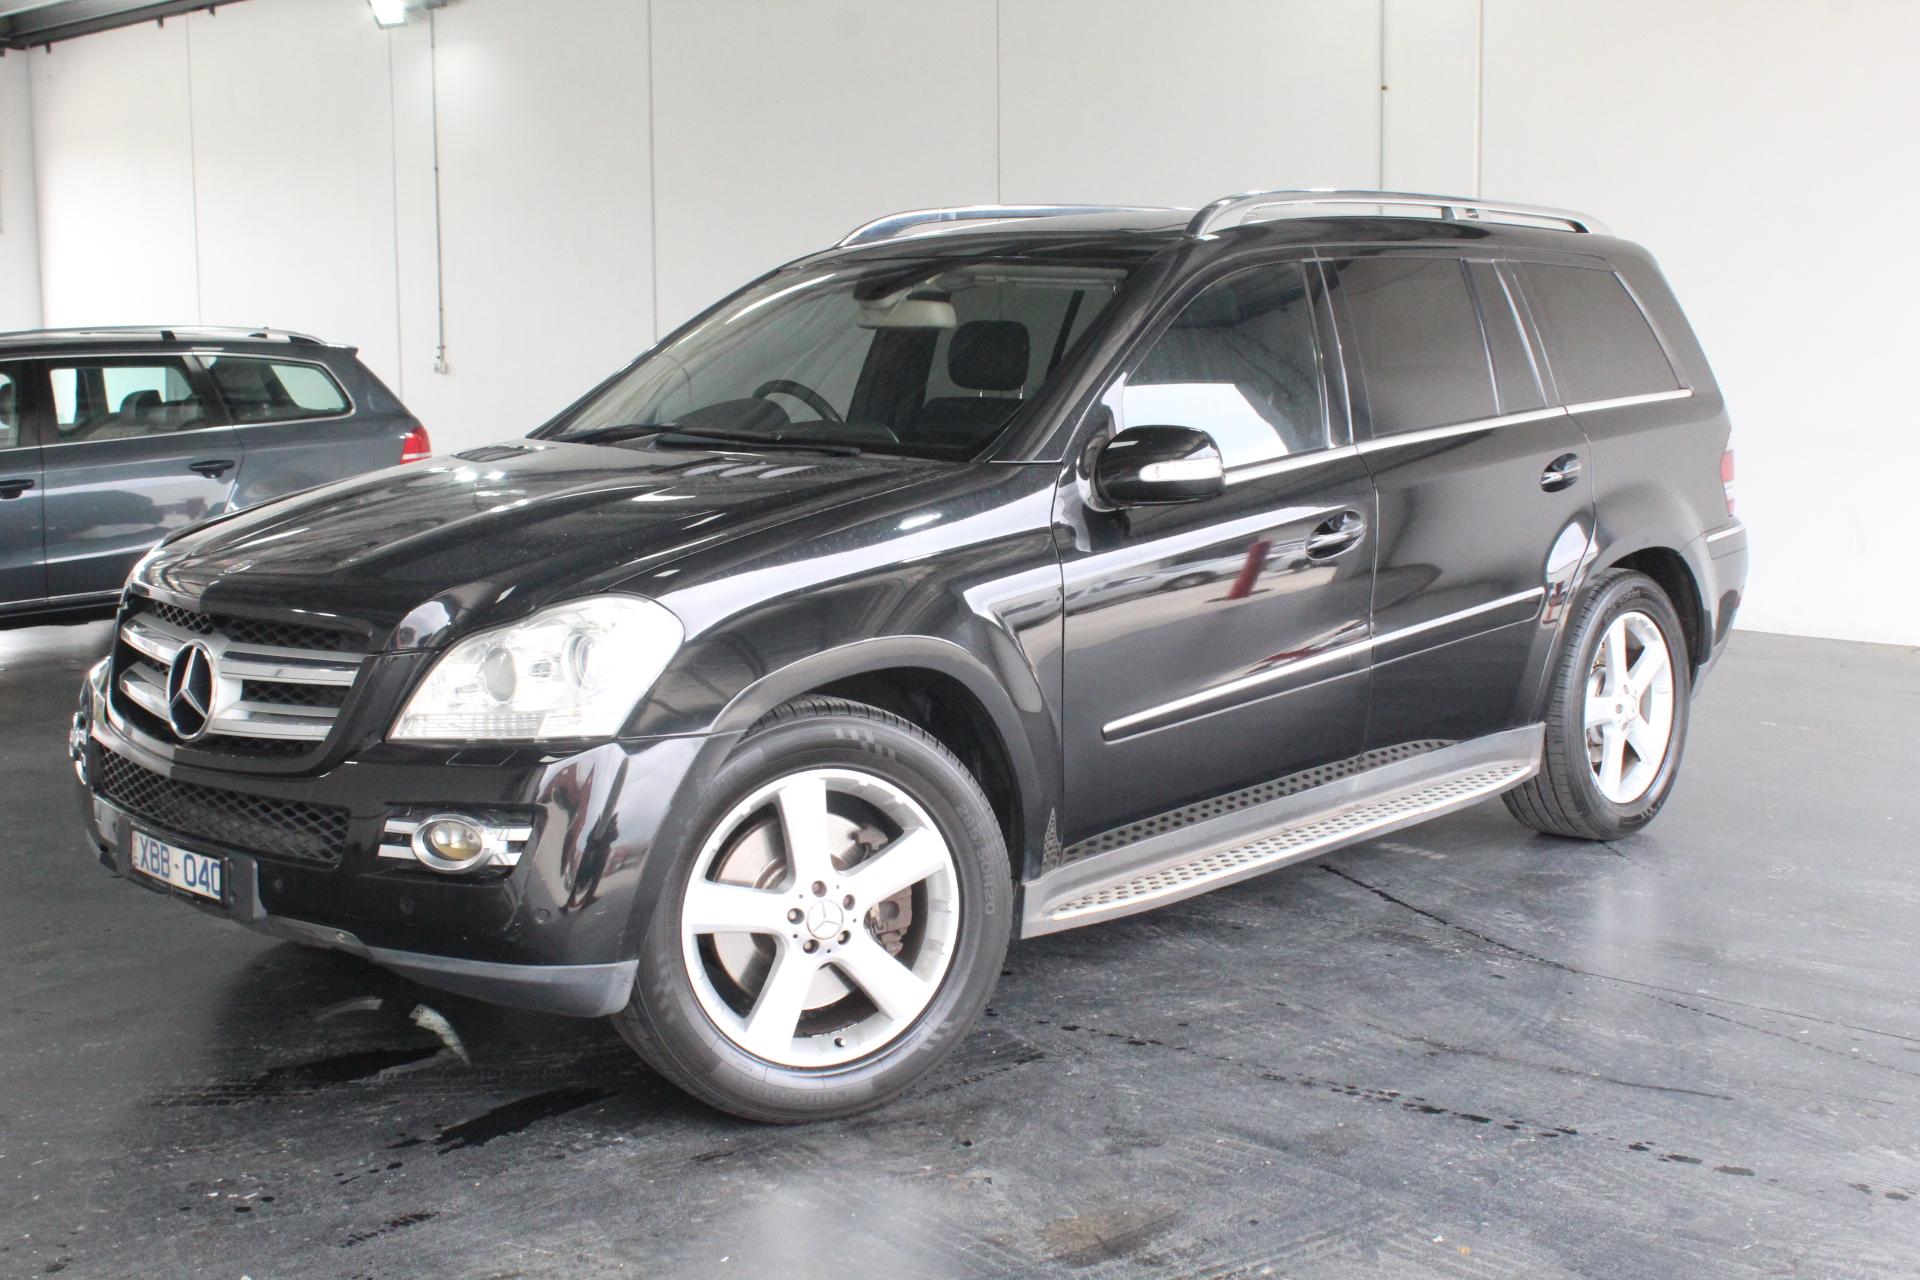 2008 Mercedes Benz GL 320 CDI X164 Turbo Diesel Automatic 7 Seats Wagon